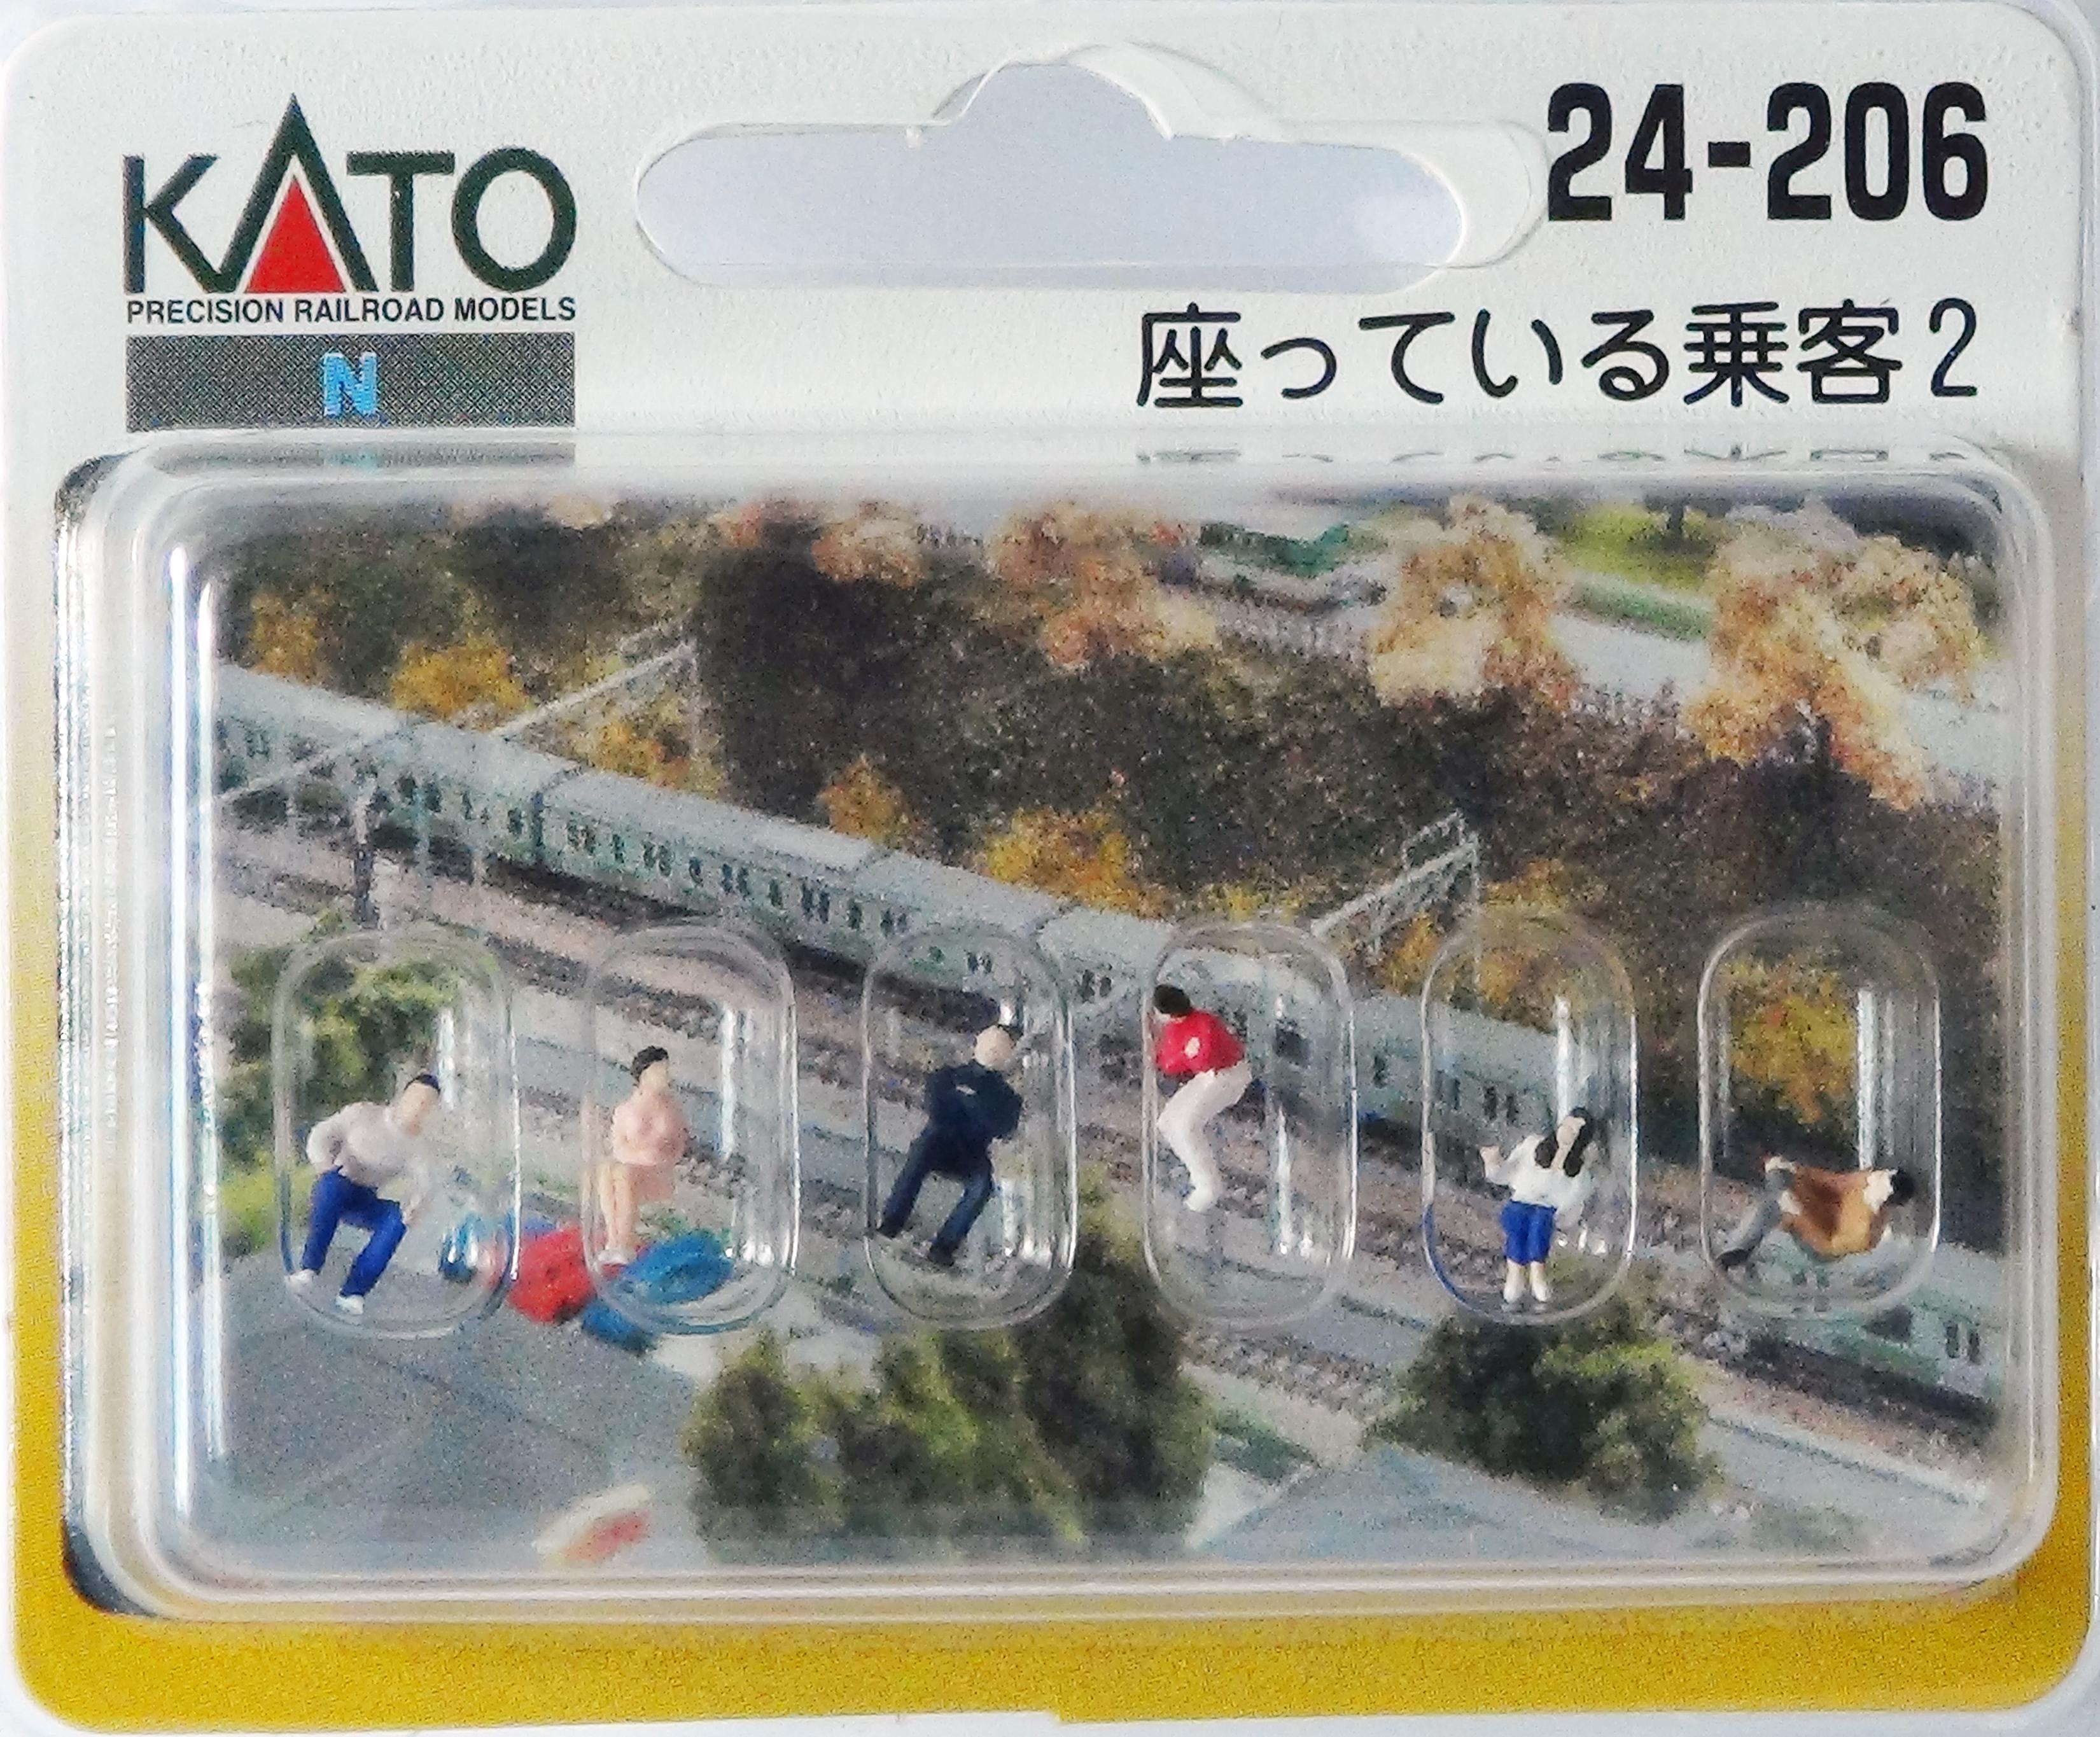 KATO 7024206 <br/>Japanese Seated Passengers #2